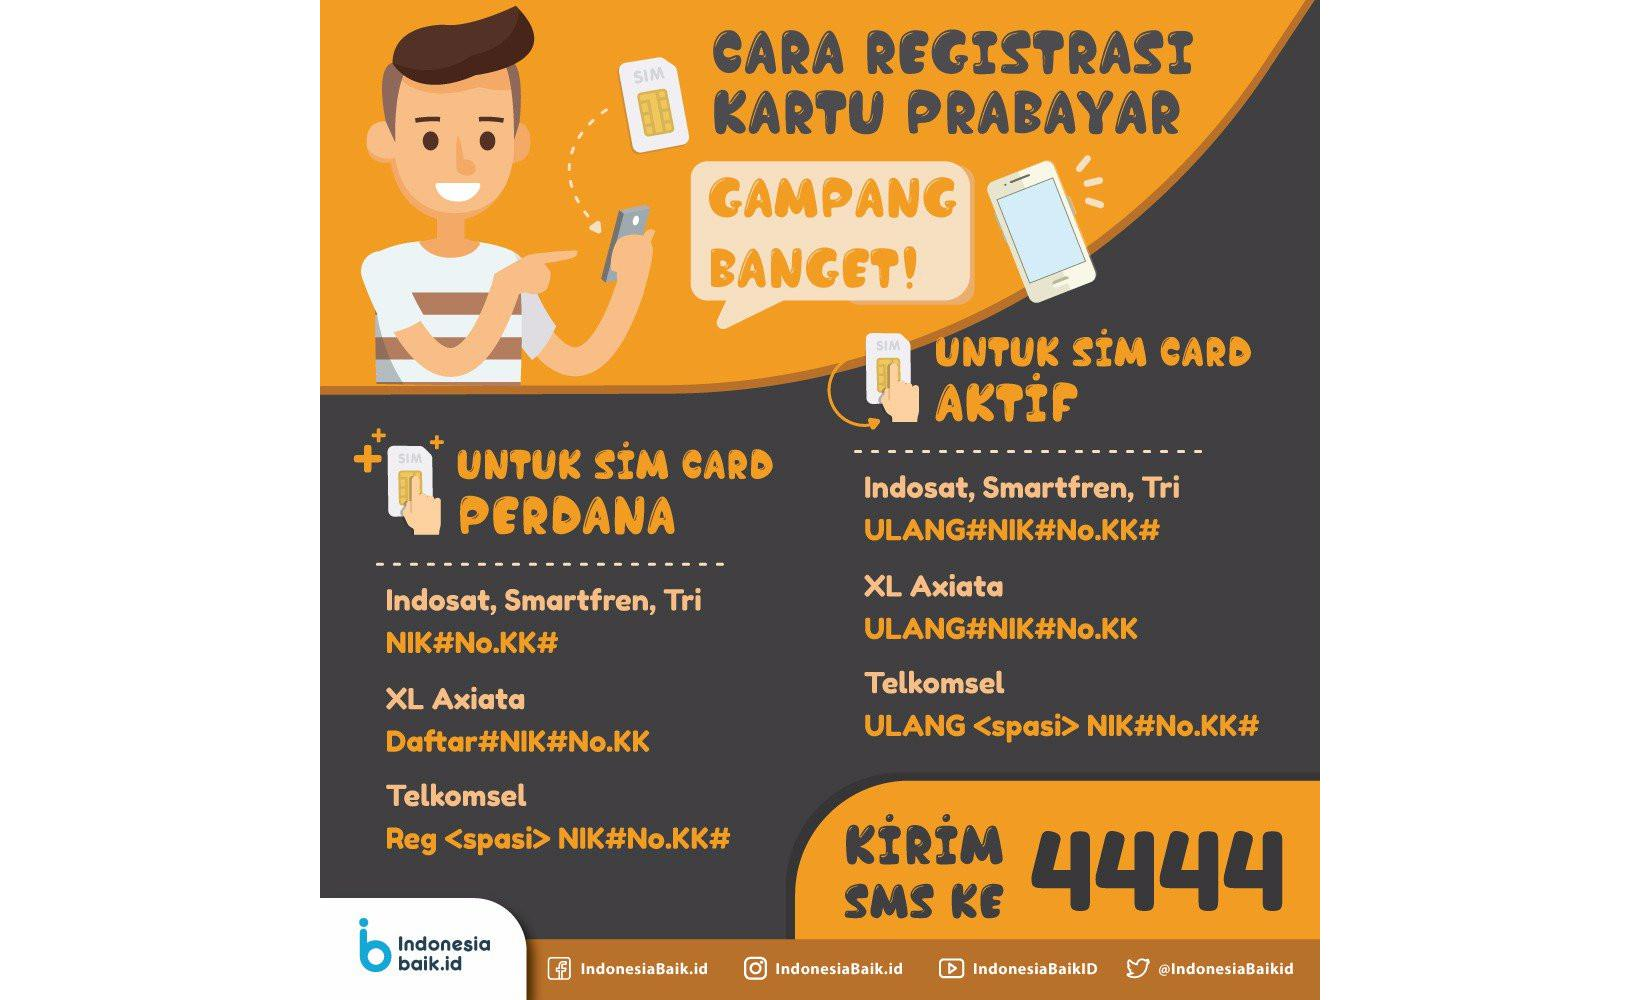 Format Registrasi Kartu Prabayar (Dok. IndonesiaBaik.id)